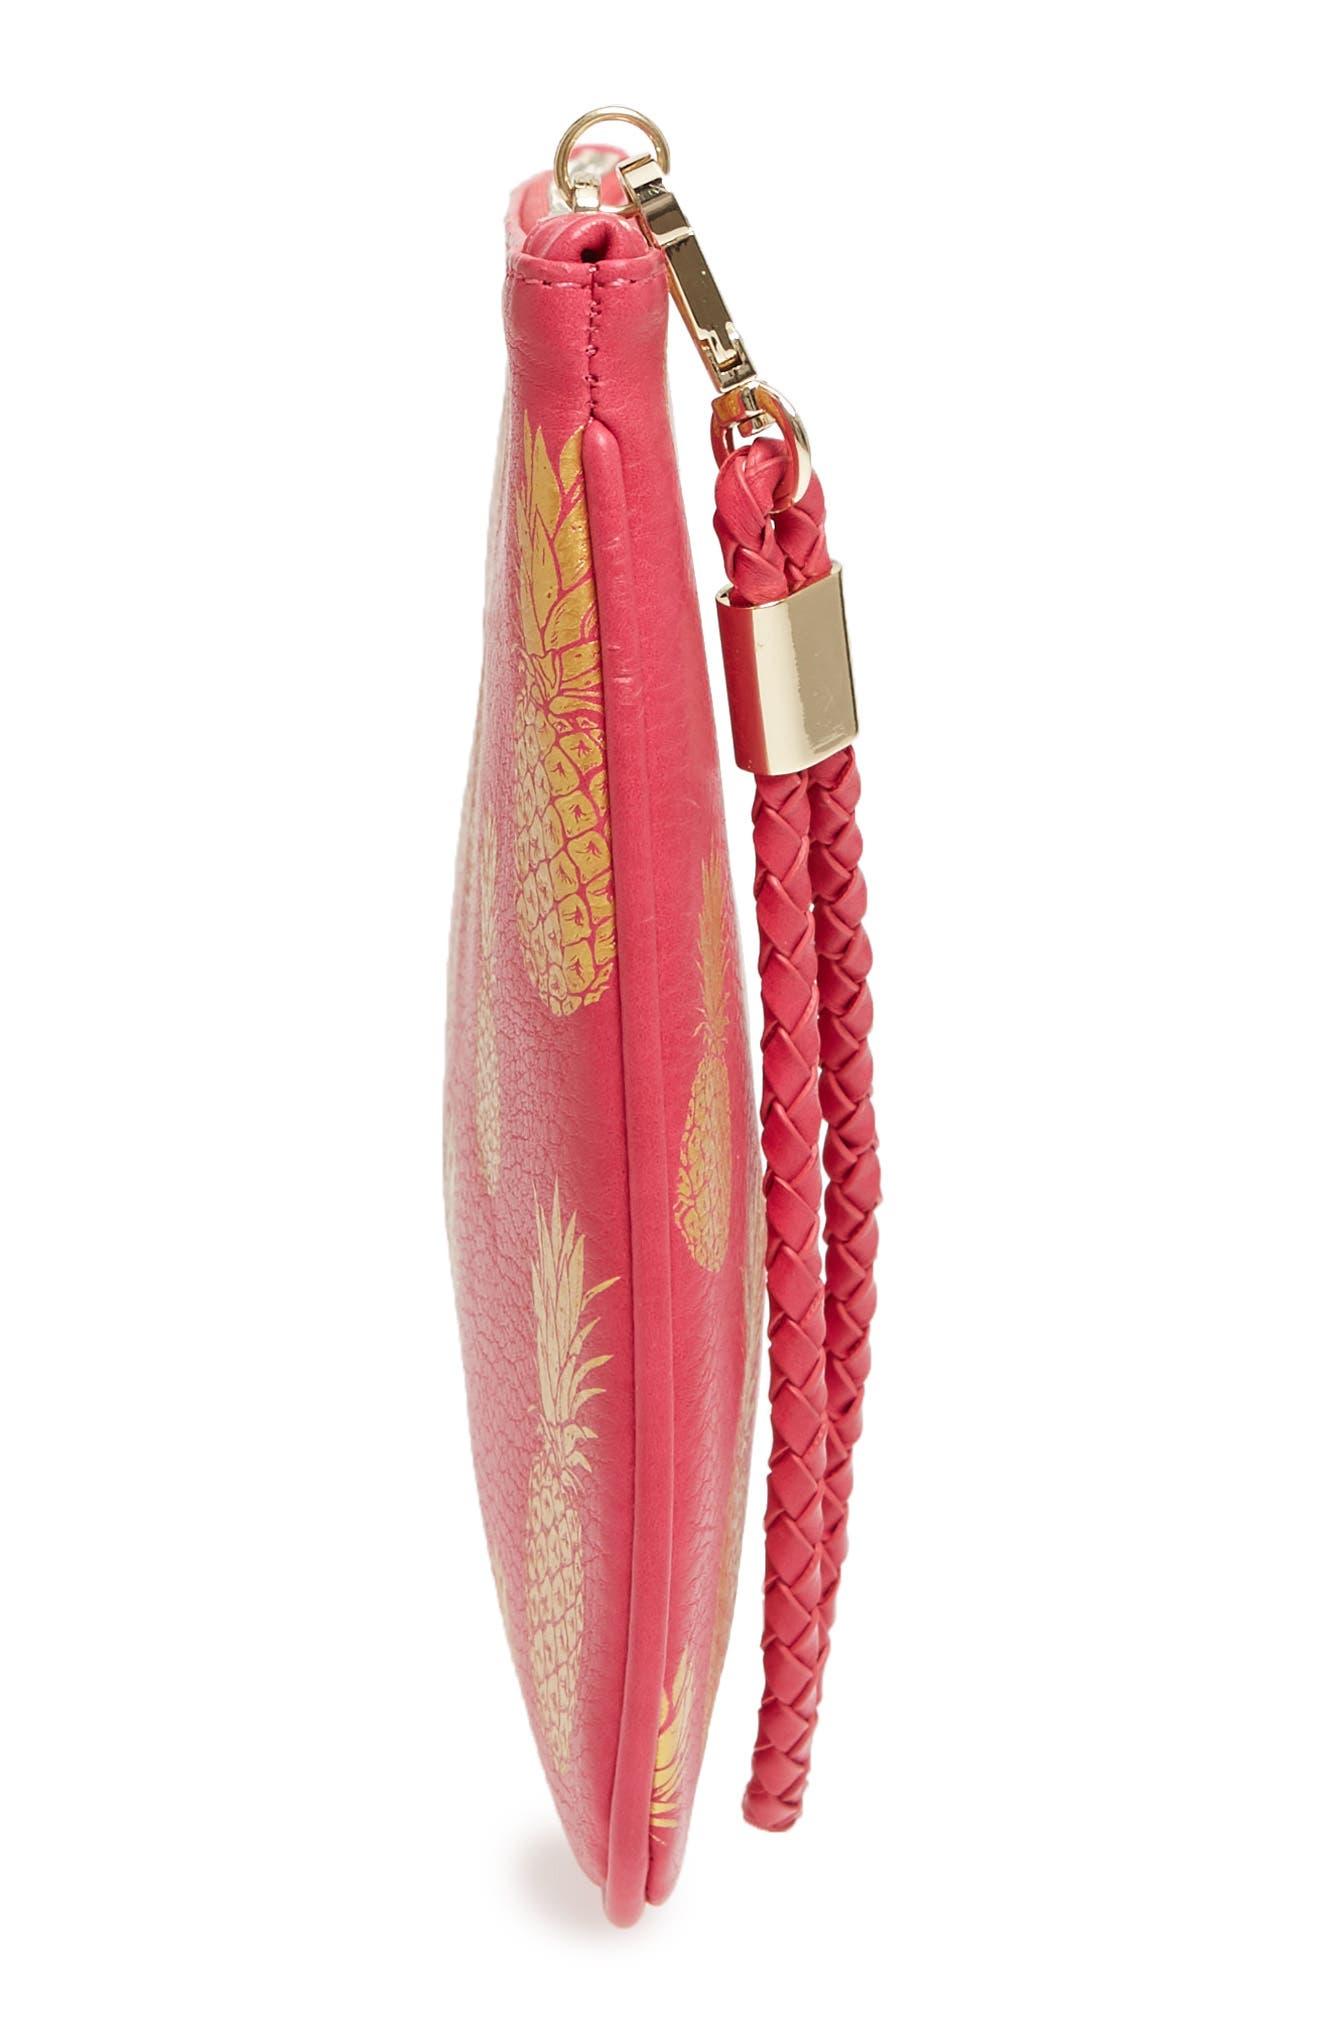 Mali + Lili Alice Pineapple Print Vegan Leather Clutch,                             Alternate thumbnail 5, color,                             Hot Pink